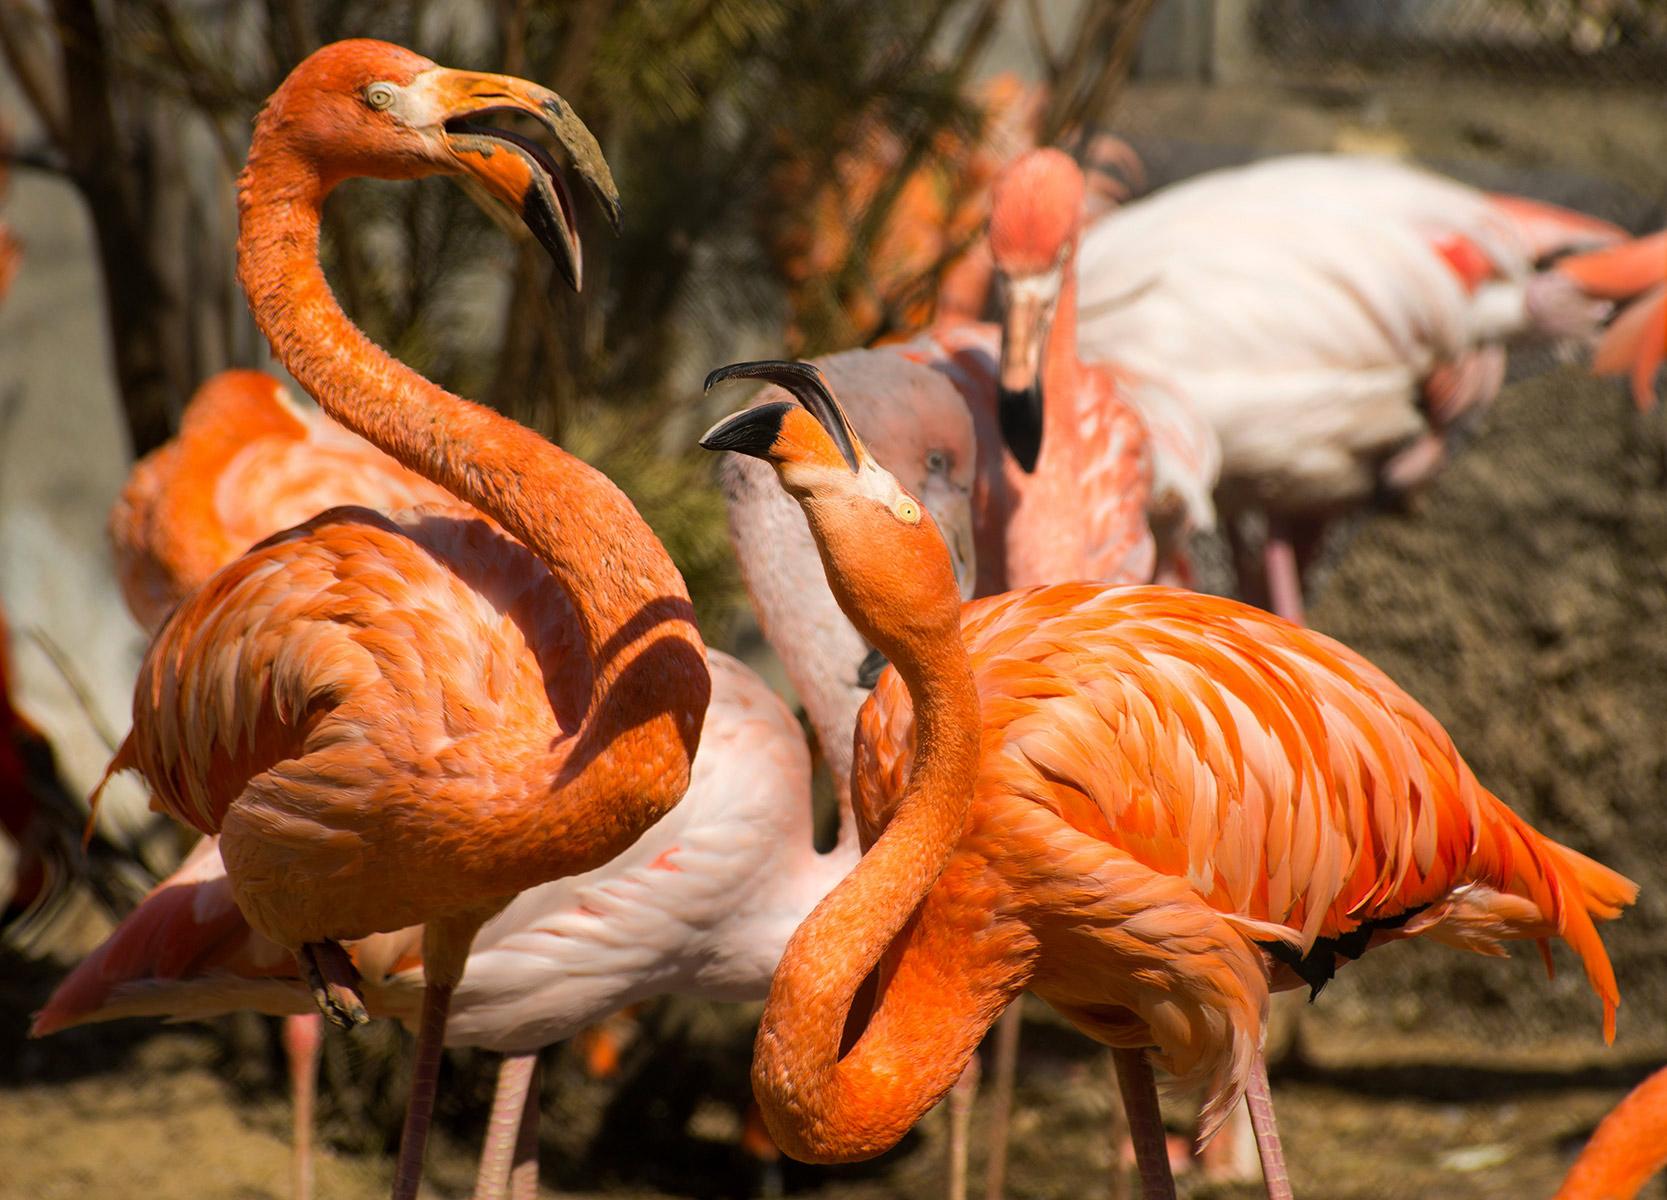 flamingo-moscowskiy-zoopark